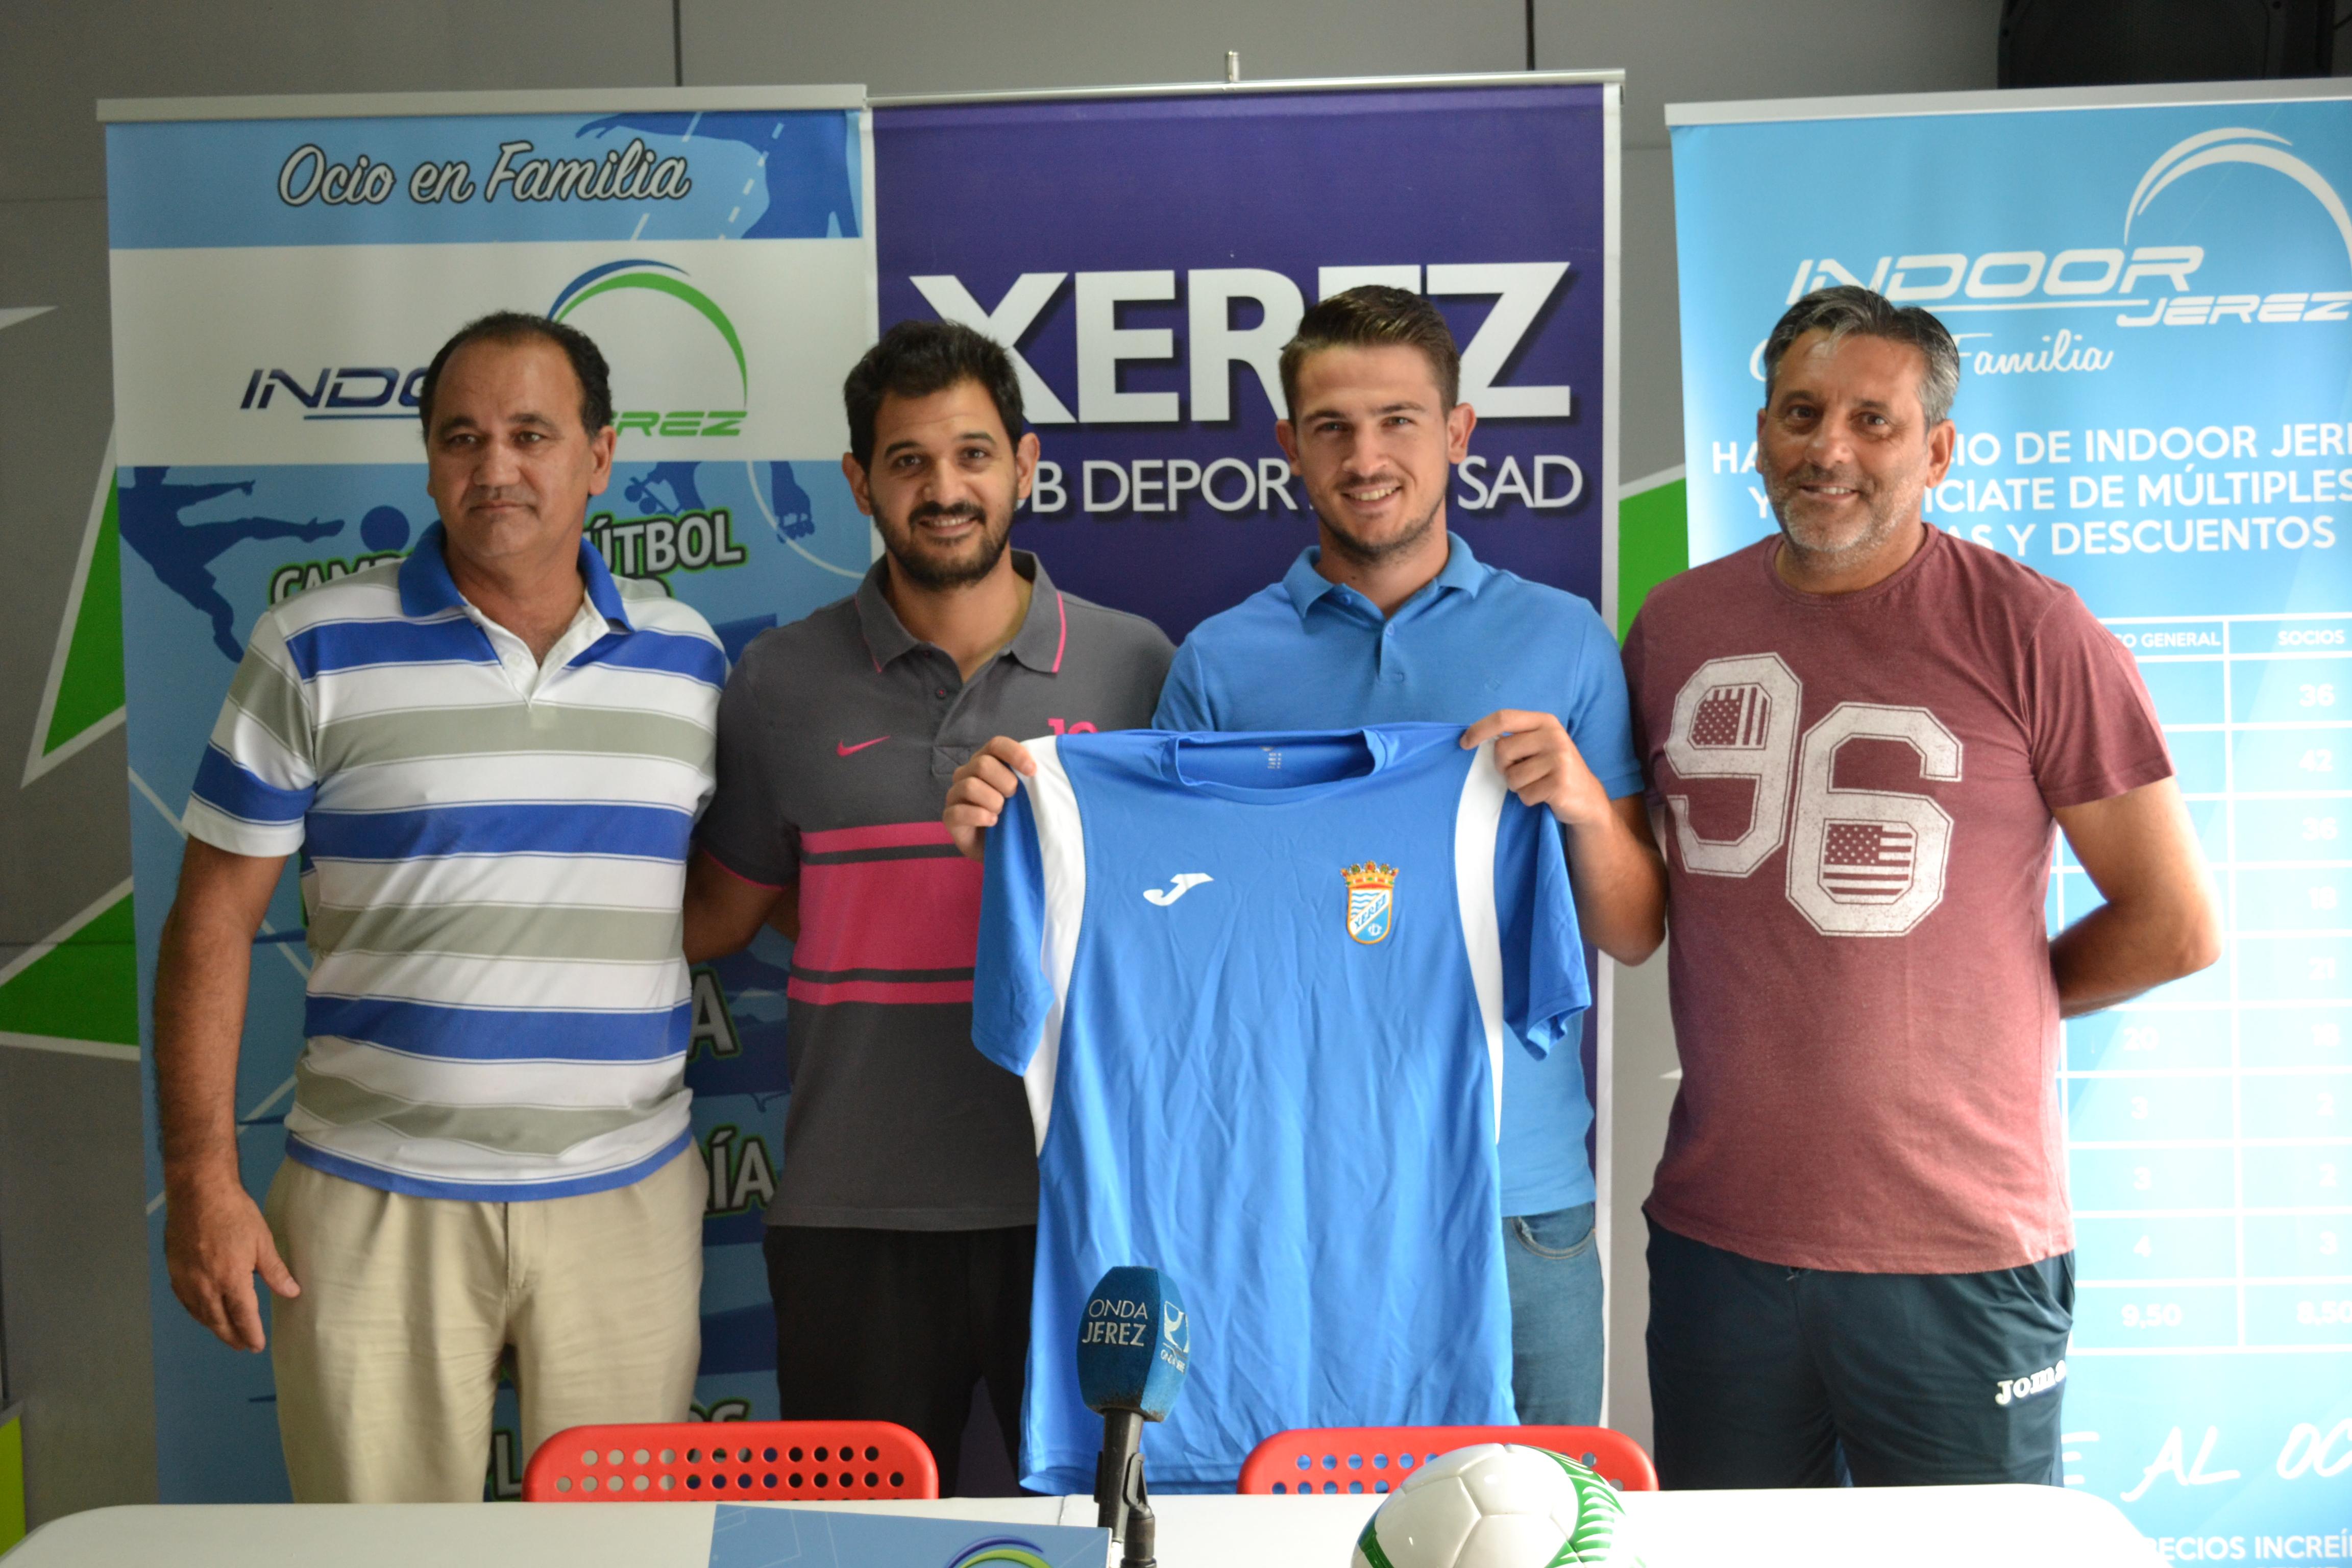 https://www.xerezclubdeportivo.es/wp-content/uploads/2017/07/DSC_0090.jpg